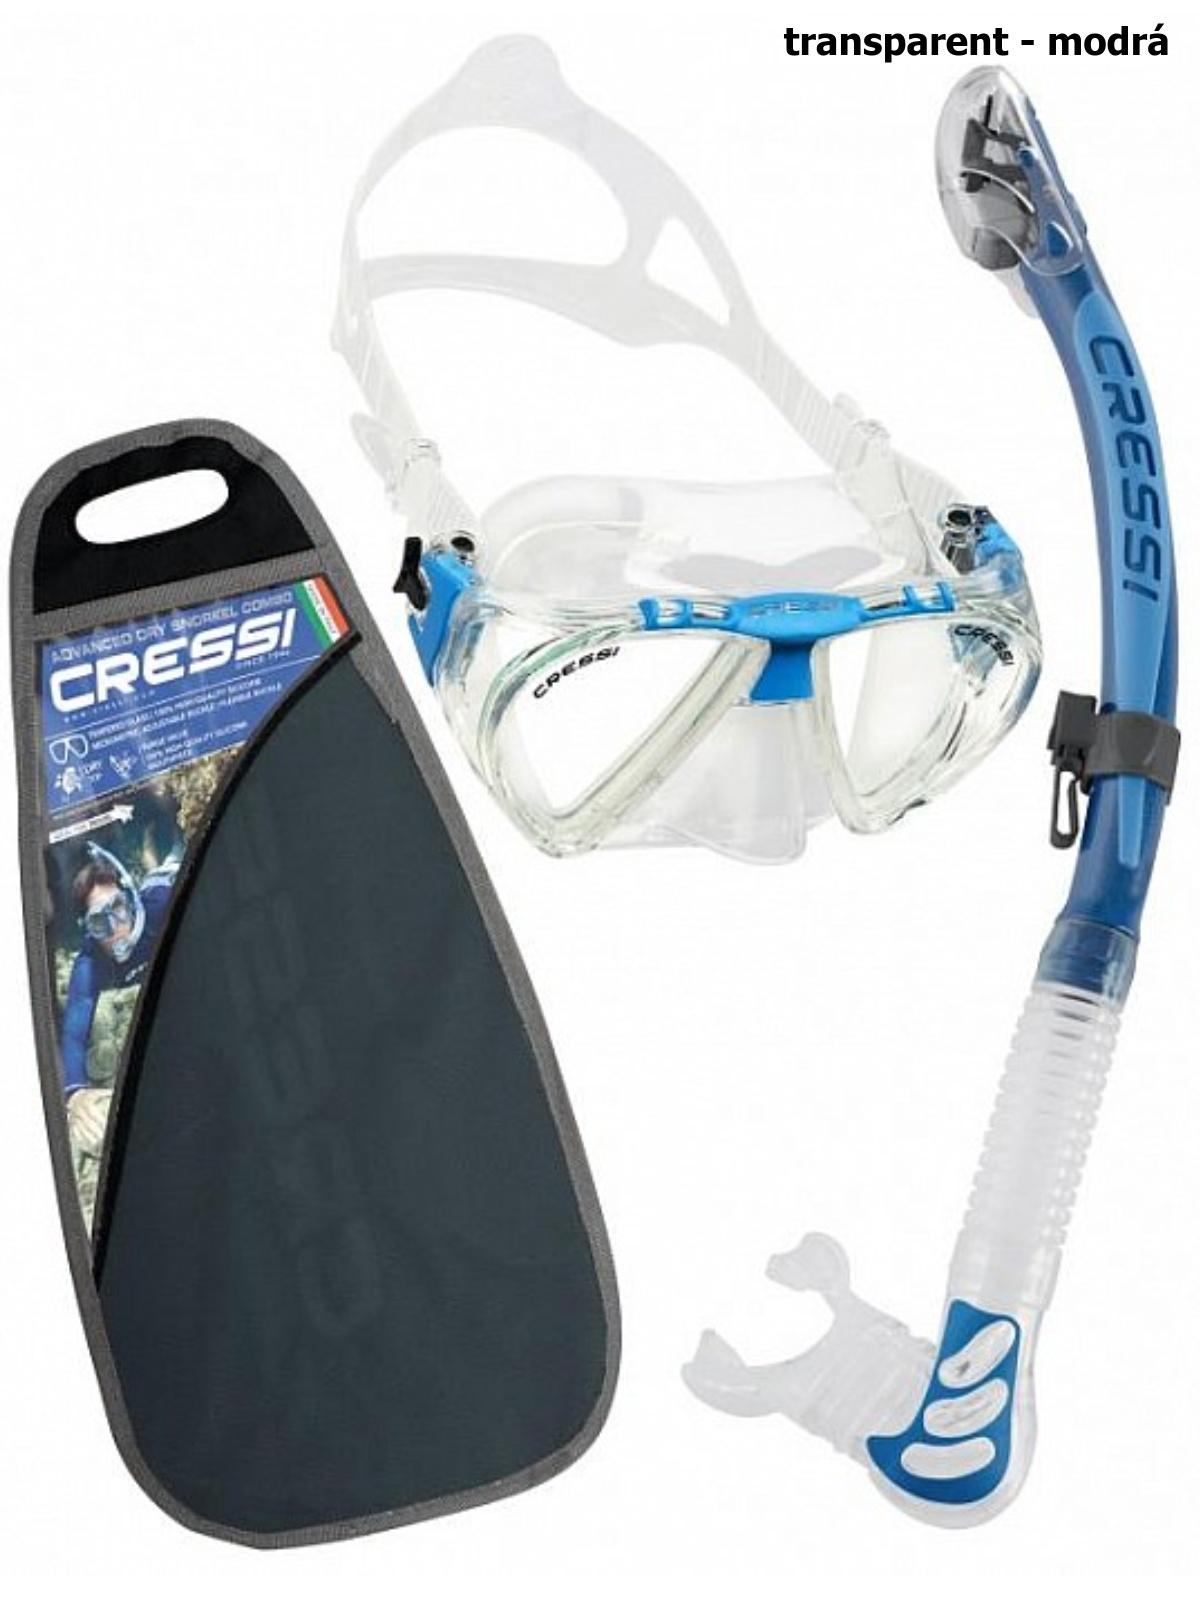 Potápačský set CRESSI Penta+Alpha Ultra Dry - transparent modrý